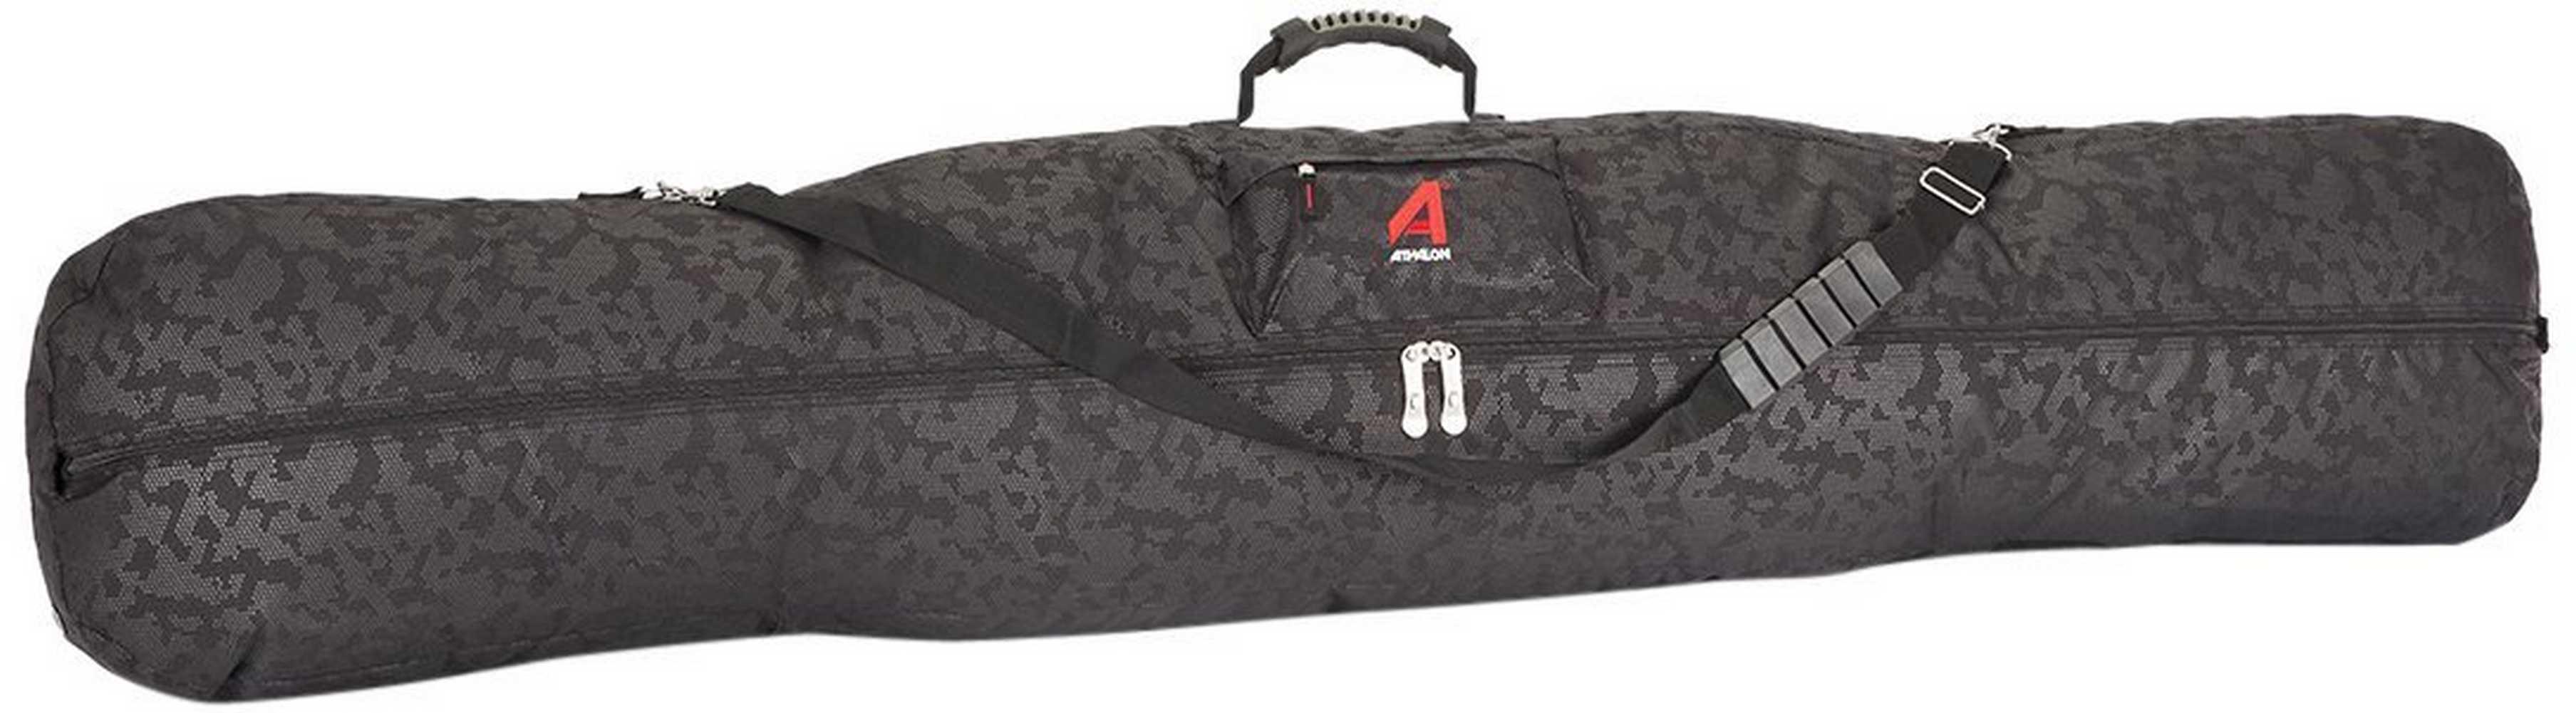 Athalon Fitted Snowboard Travel Borsa 170cm. Options. Color Options. 170cm. 356 c7cc8c